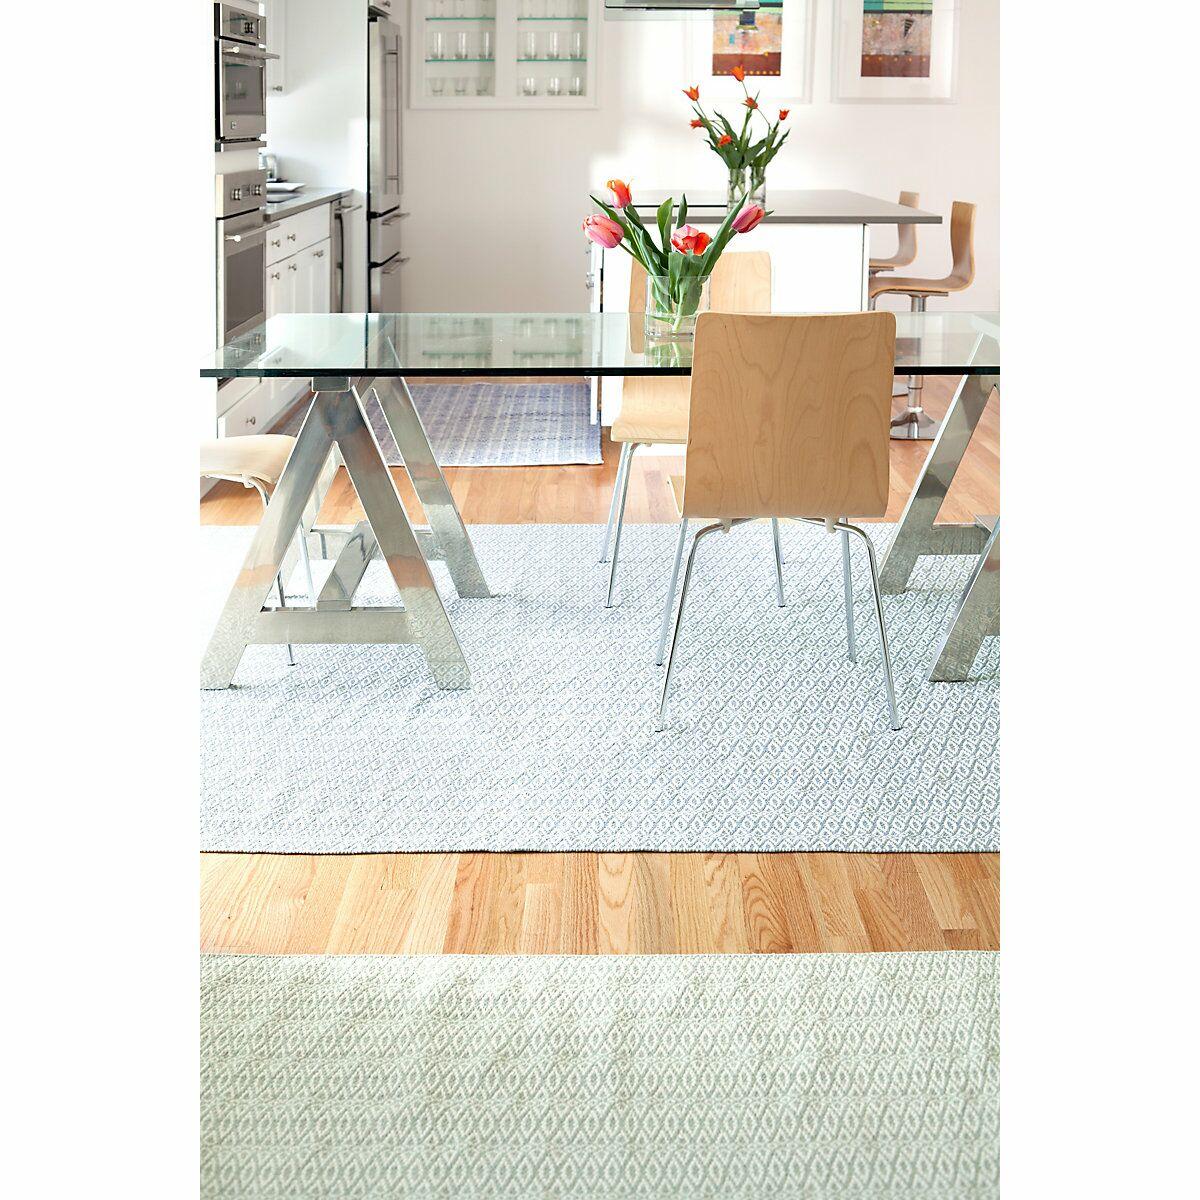 Fair Isle Hand Woven Blue/White Area Rug Rug Size: 6' x 9'